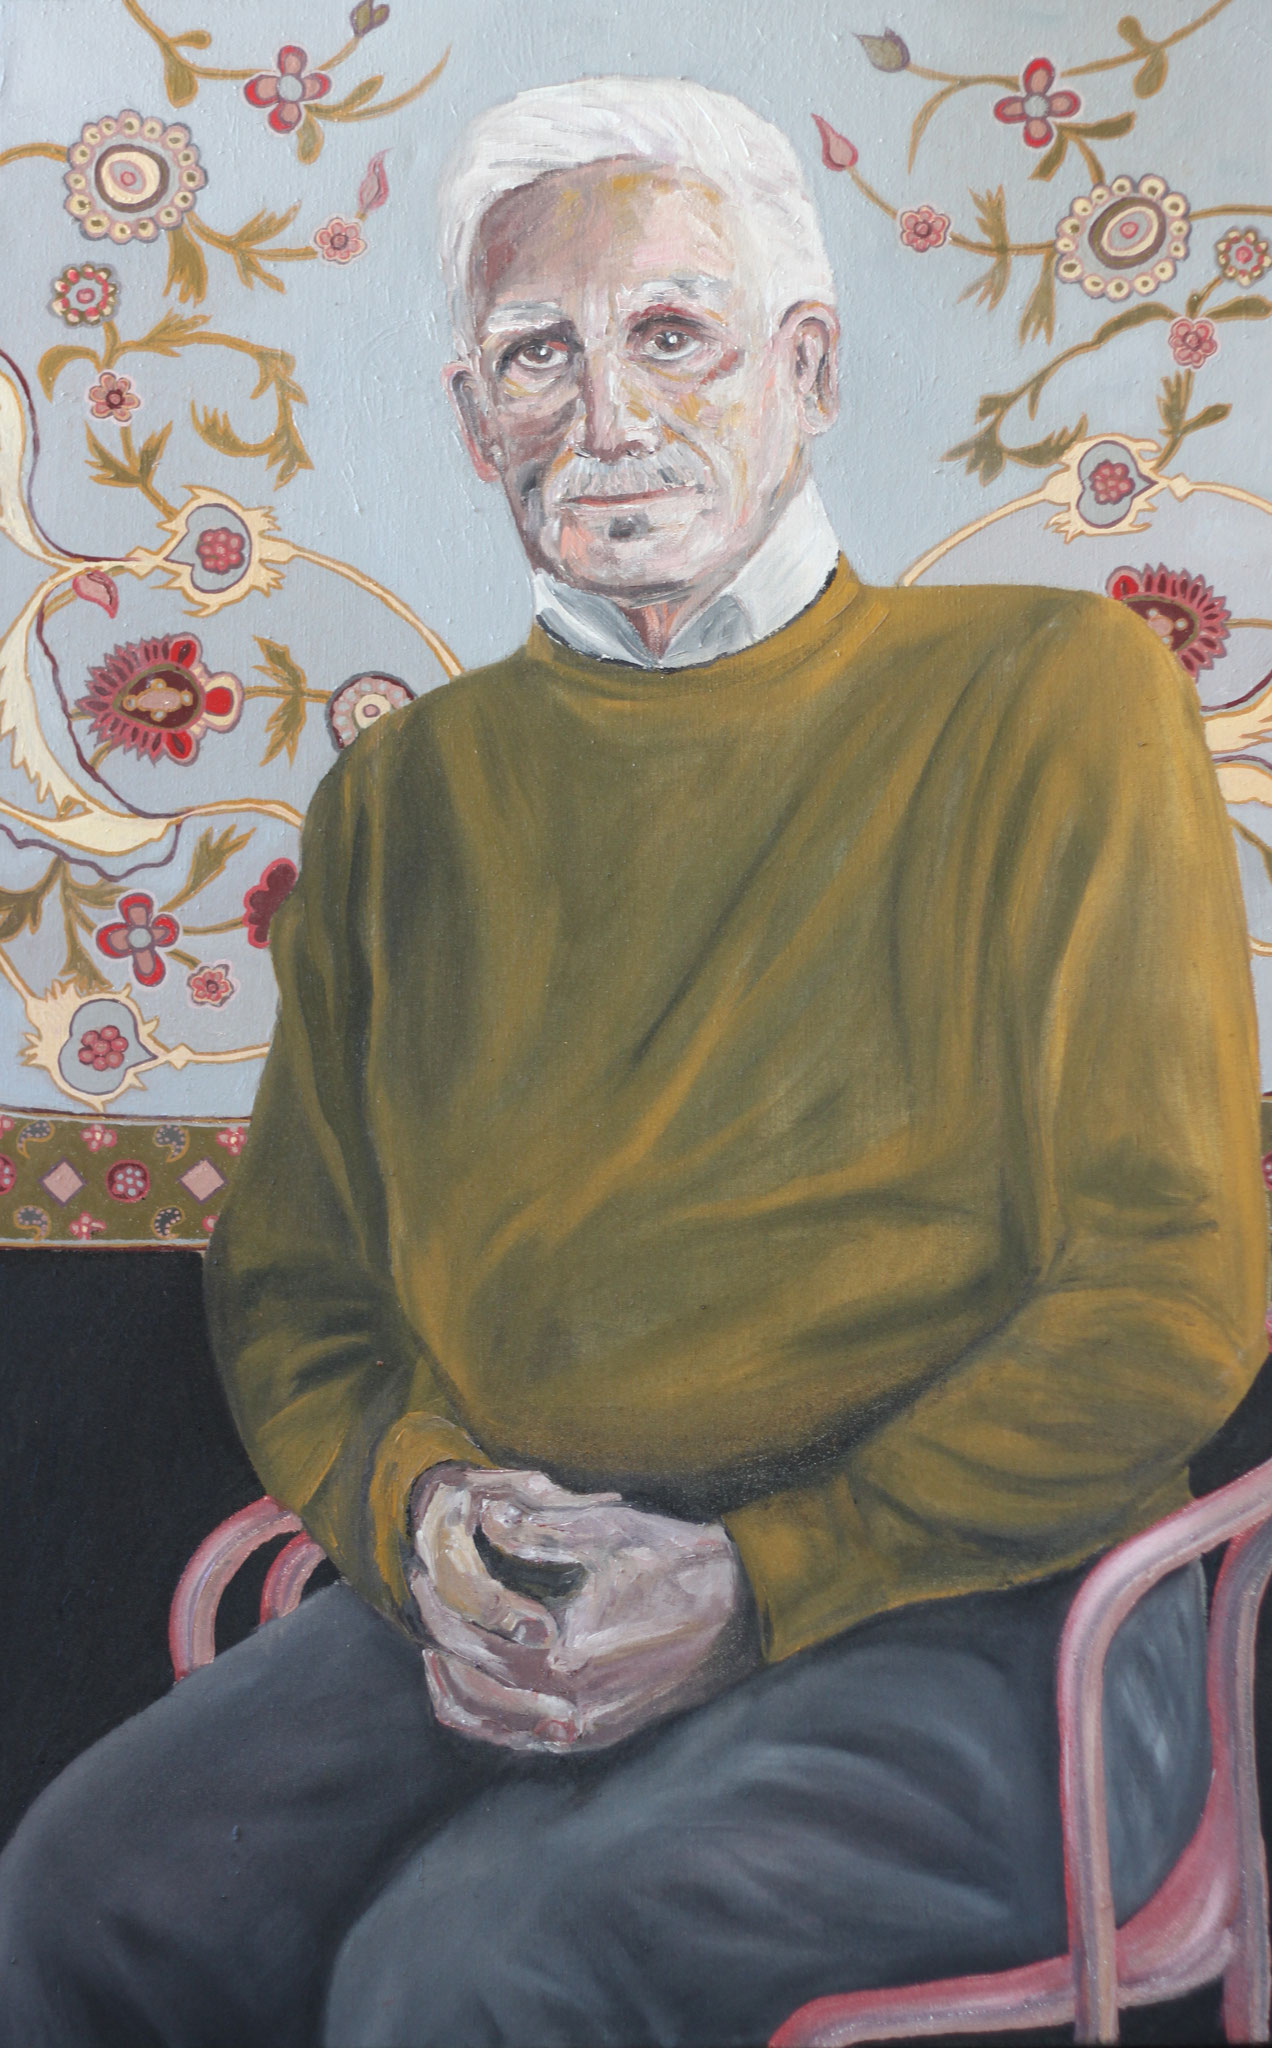 Nader, Öl auf Leinwand, 110 cm x 70 cm, 2015